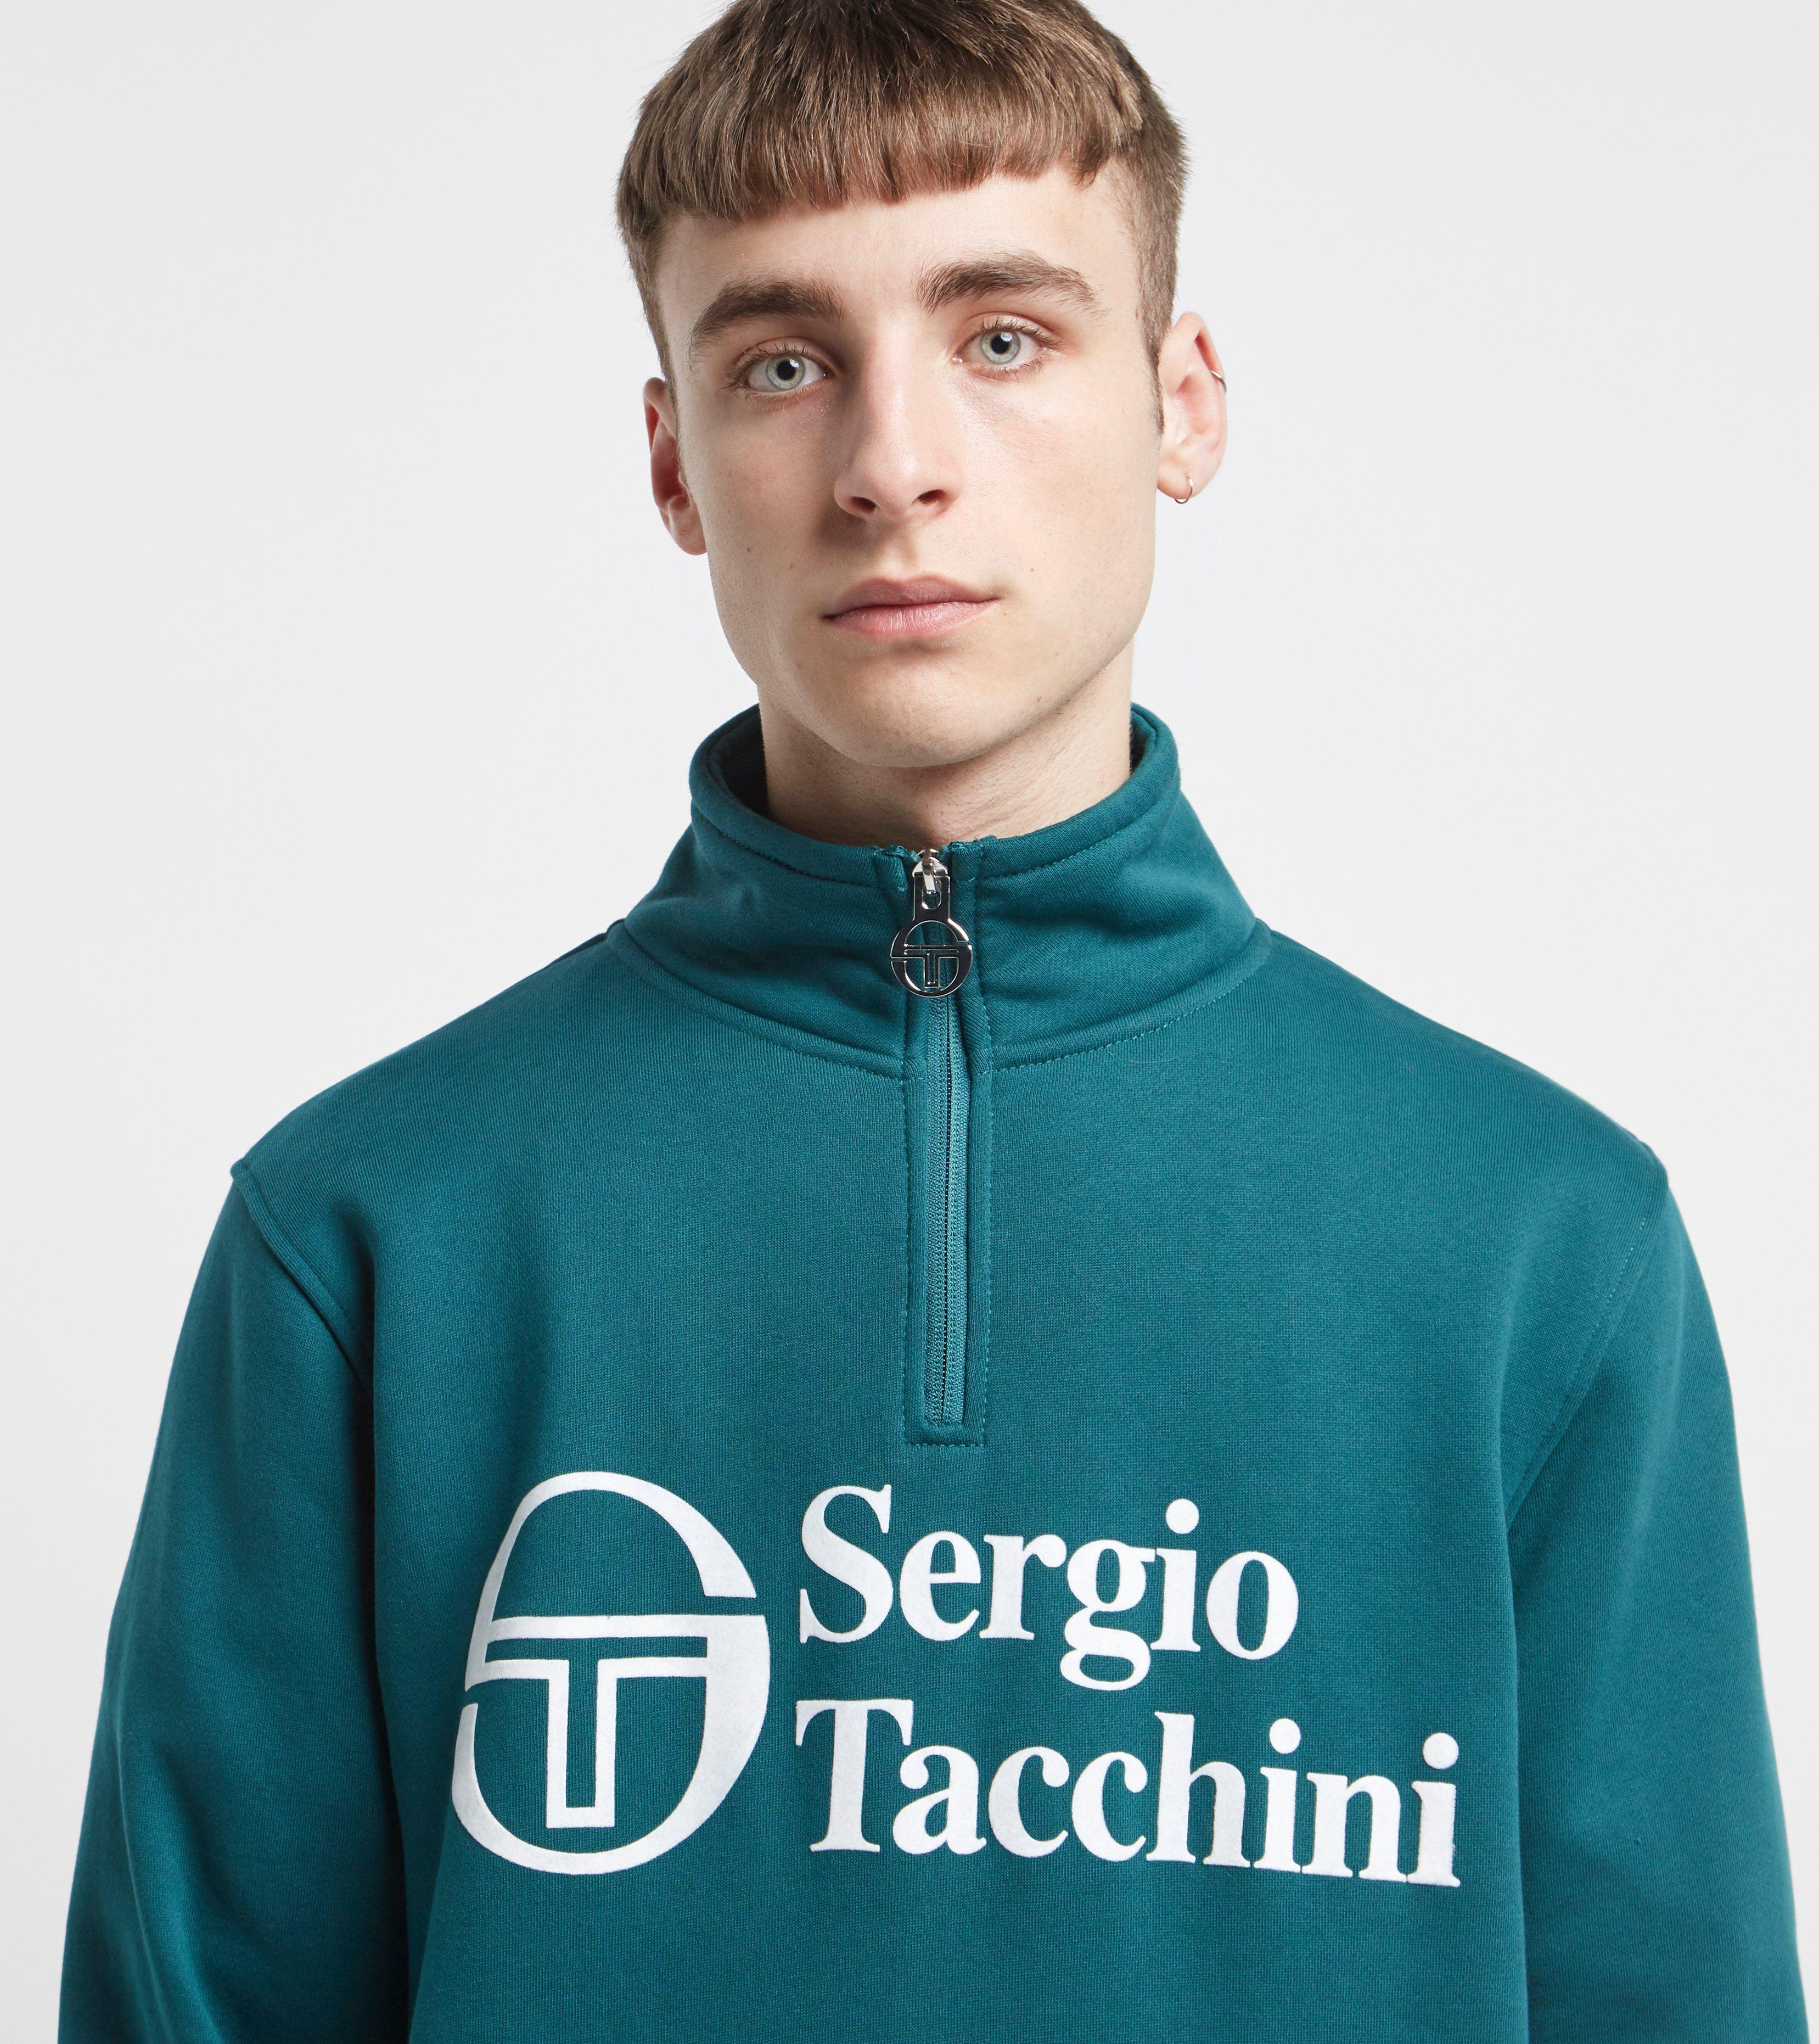 Sergio Tacchini Mats Half Zip Sweatshirt